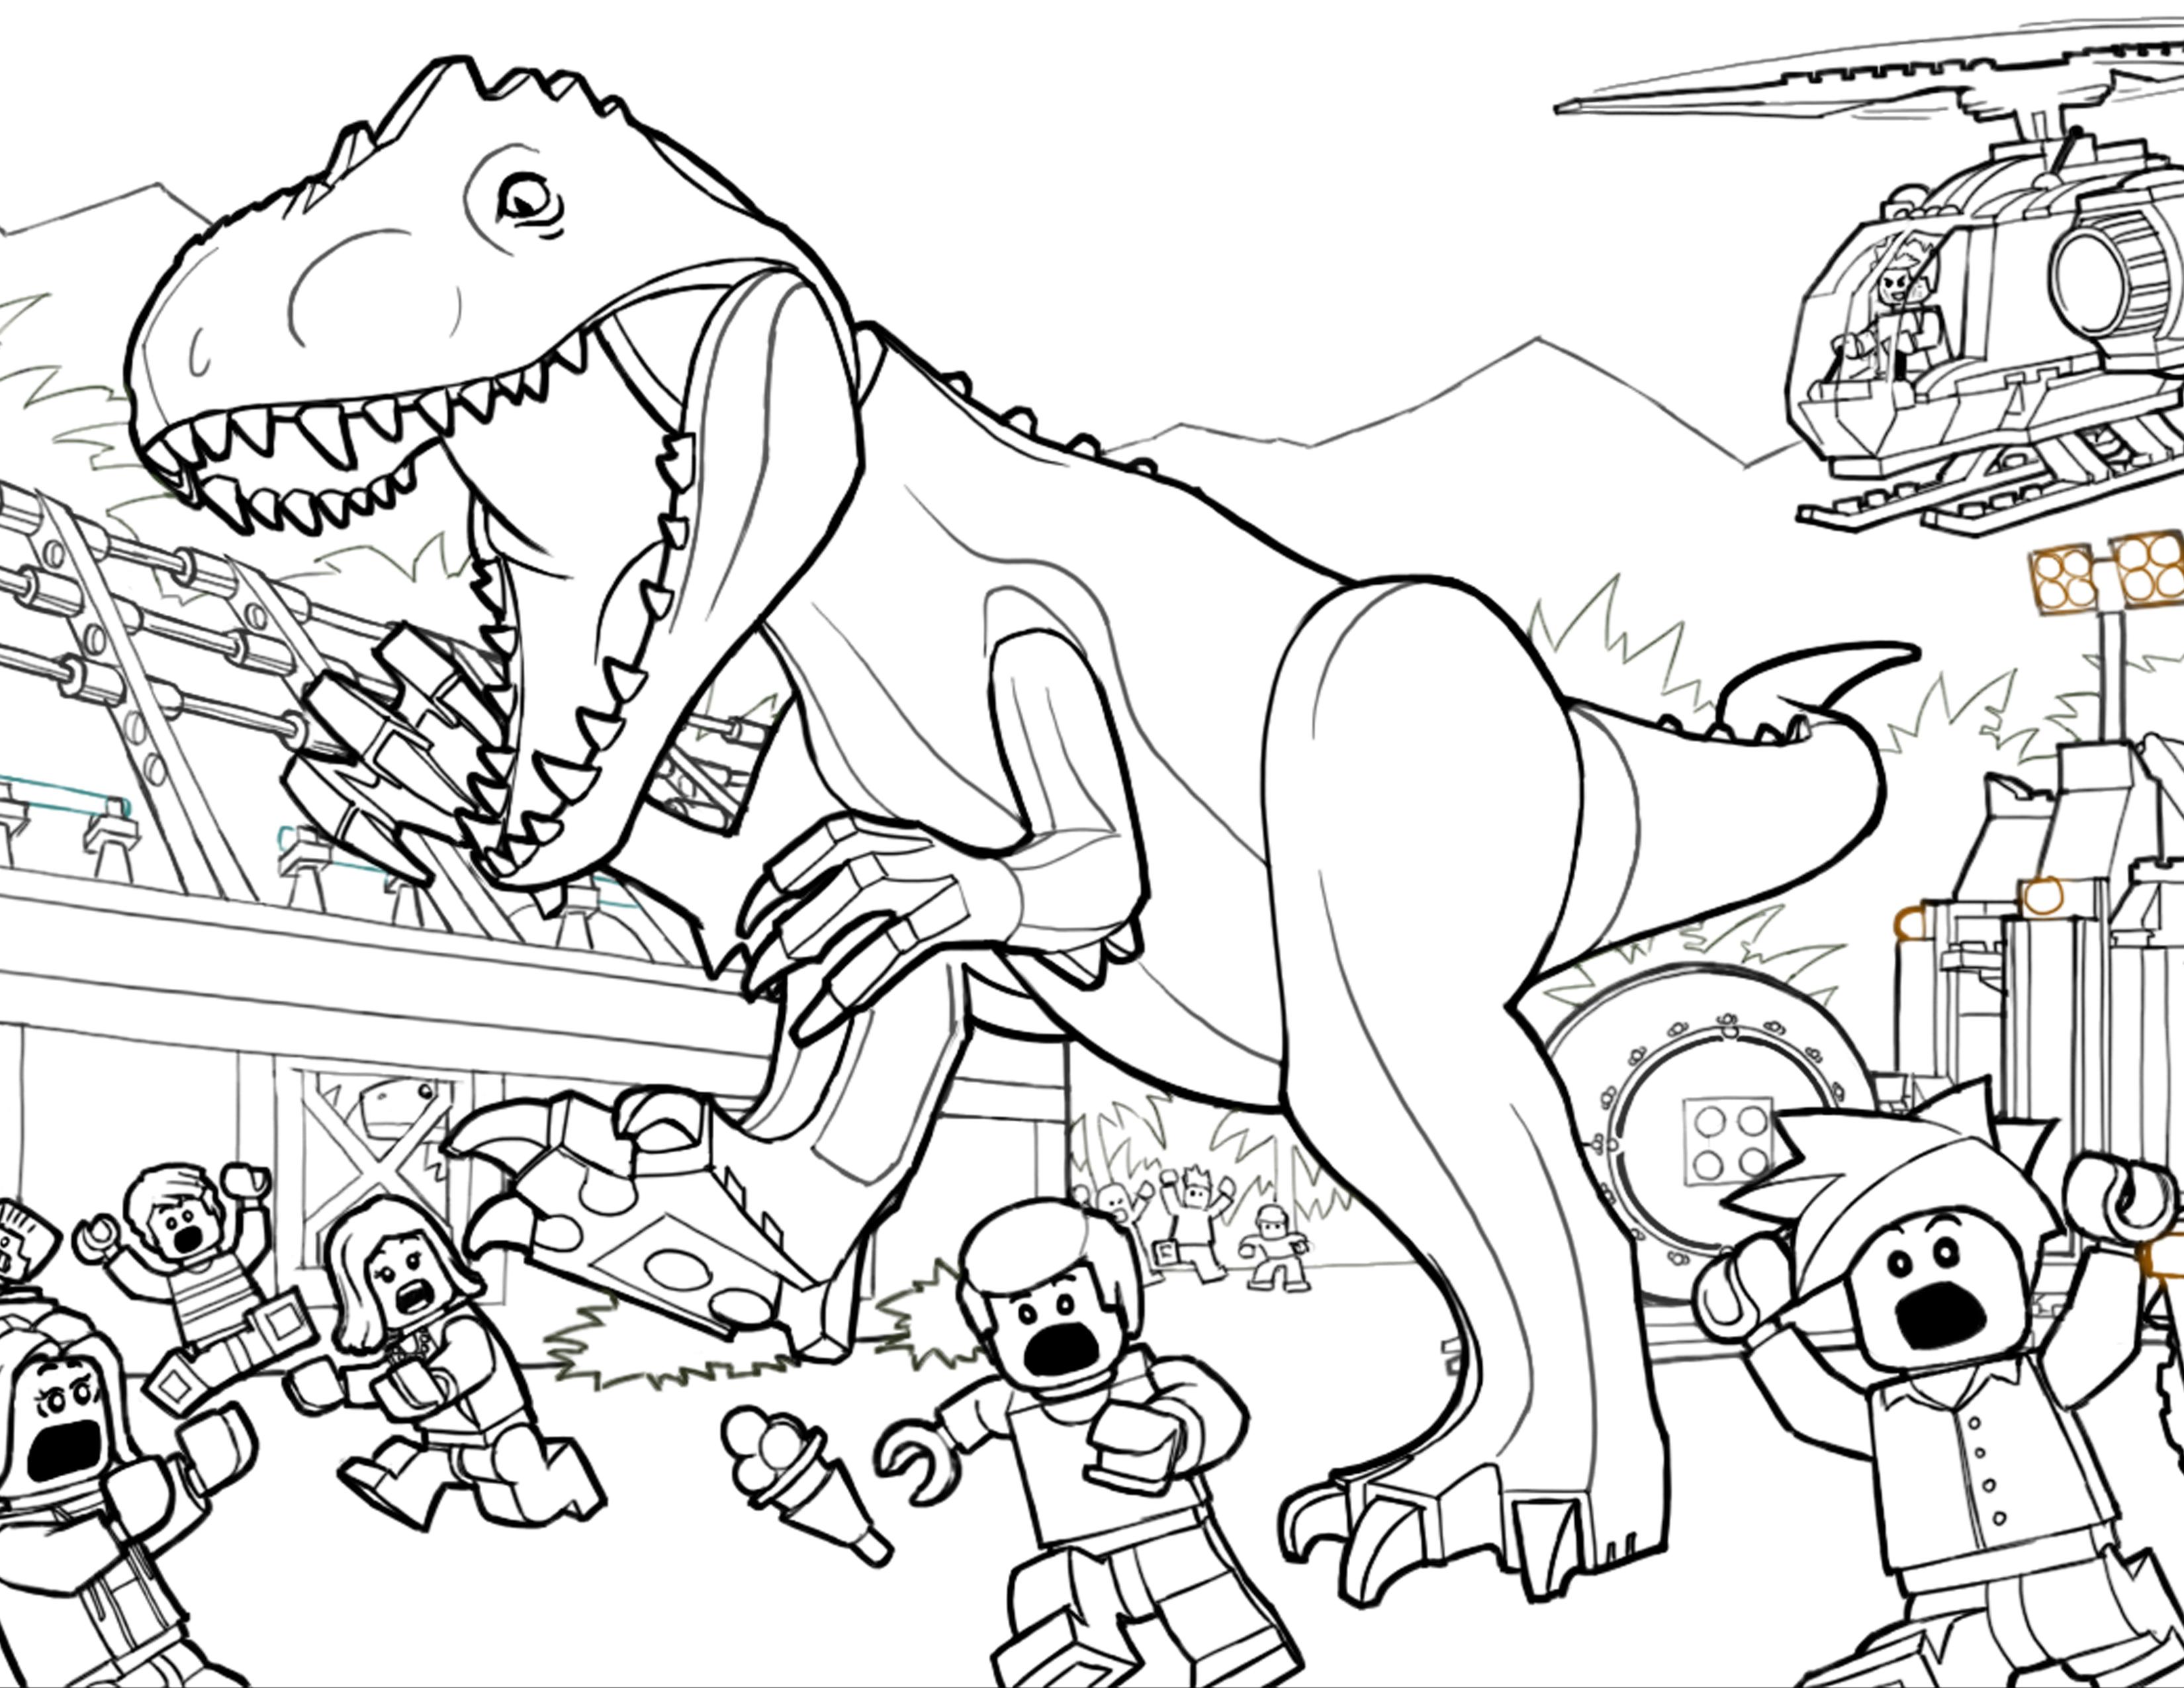 33 dibujos de Jurassic park para colorear   Oh Kids   Page 1